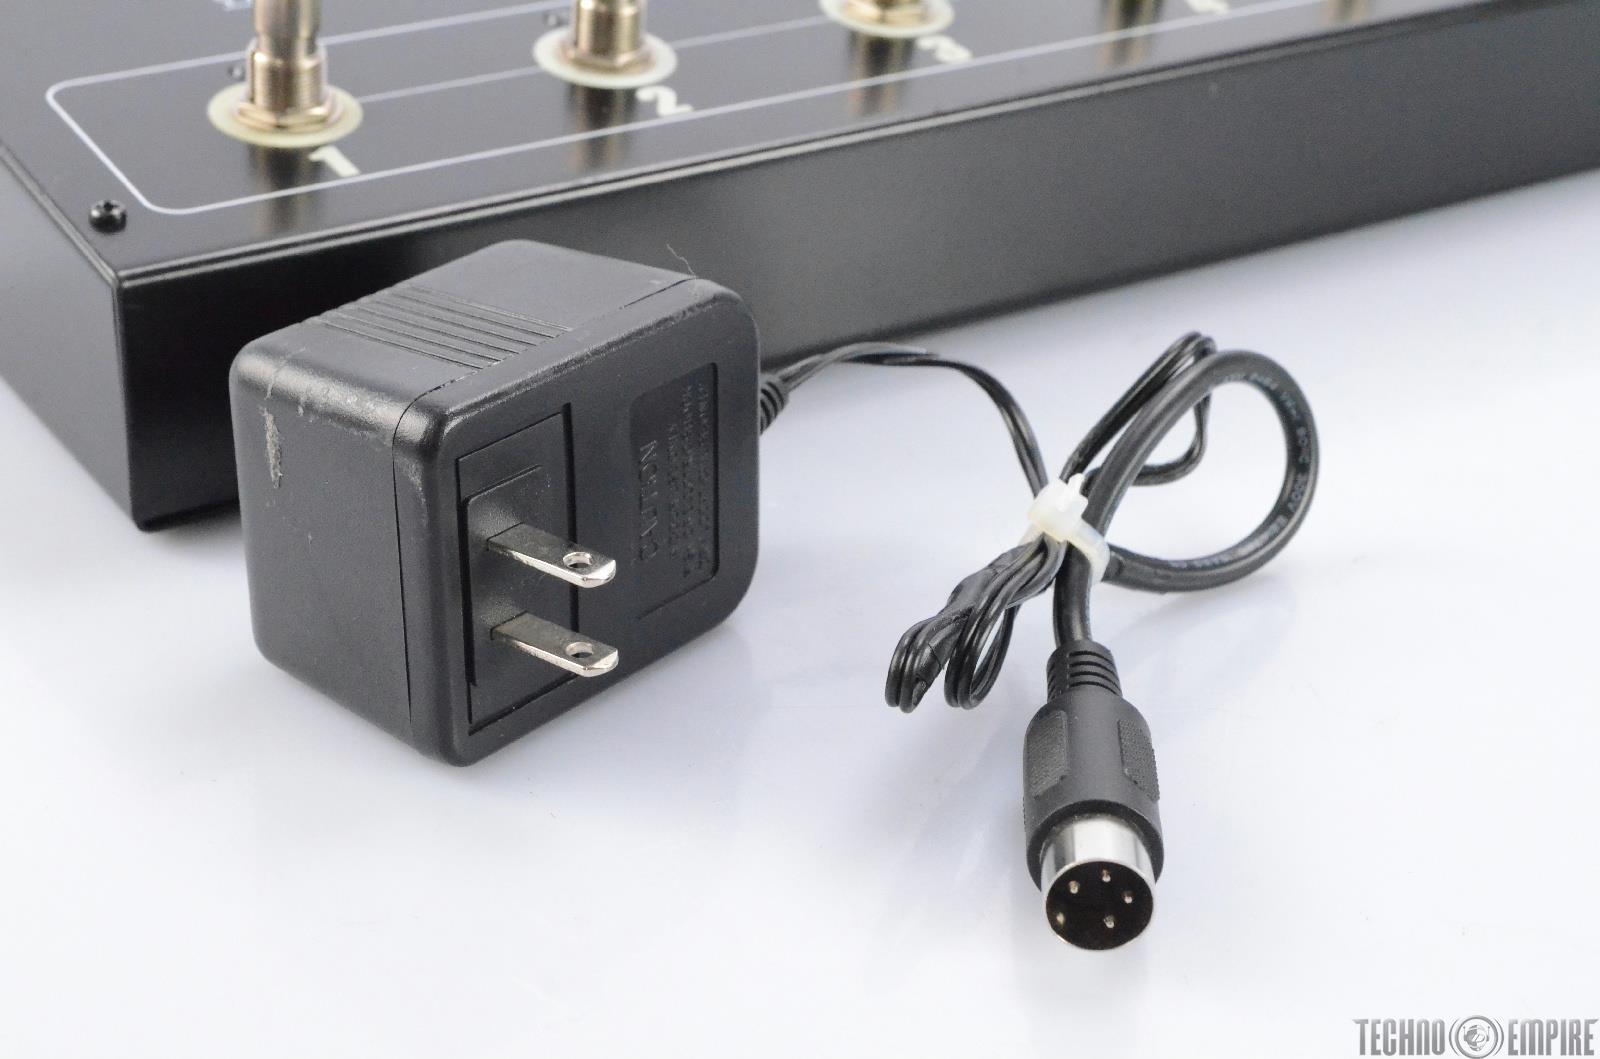 rocktron patchmate loop 8 floor audio switcher guitar foot pedal midi 27090. Black Bedroom Furniture Sets. Home Design Ideas